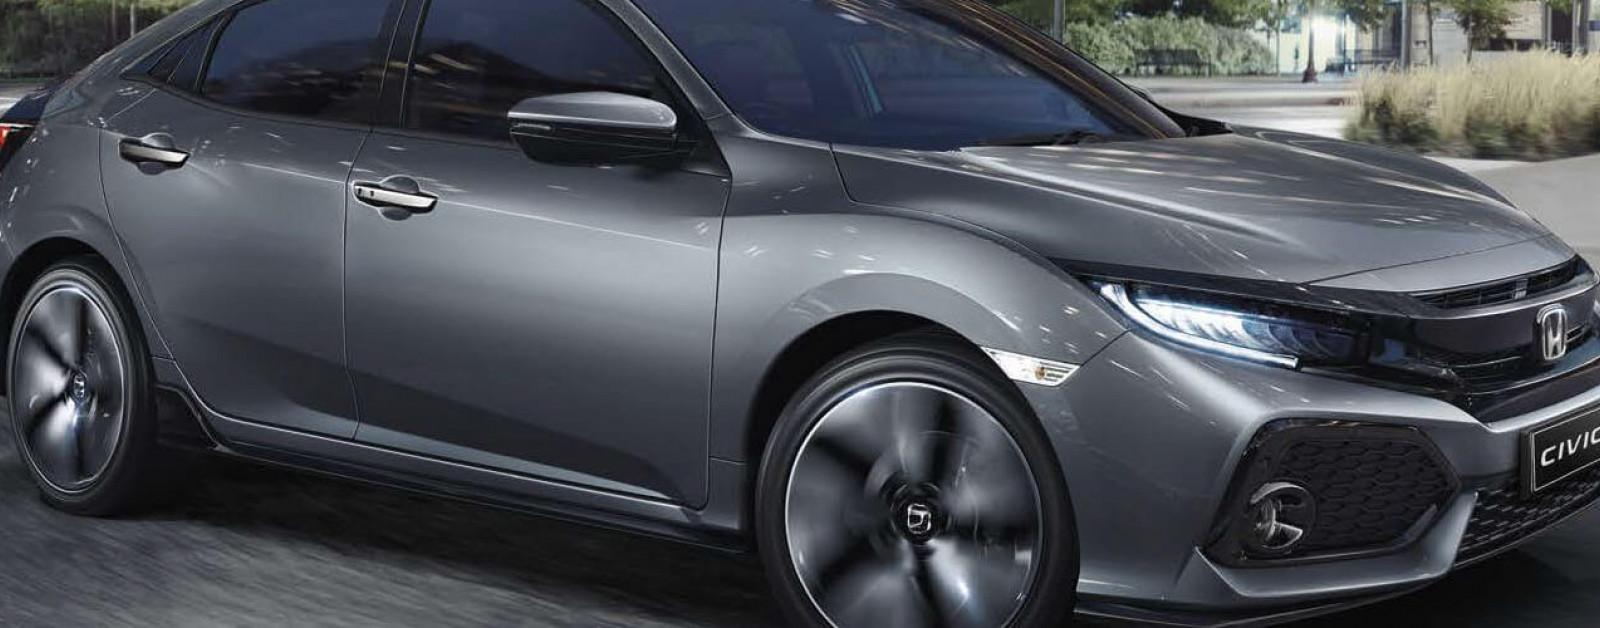 New Honda Civic Hatch For Sale In Brisbane Austral Honda